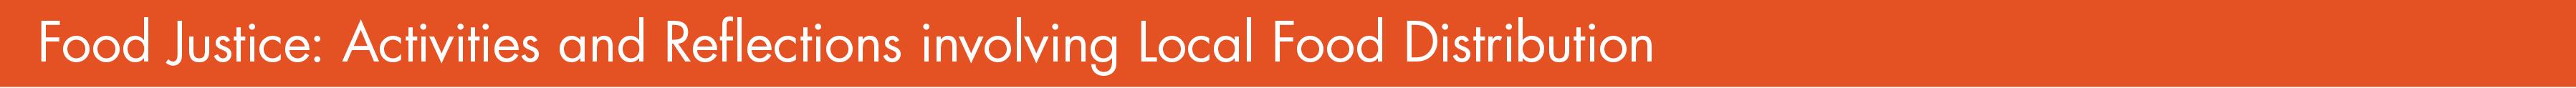 new orange food justice